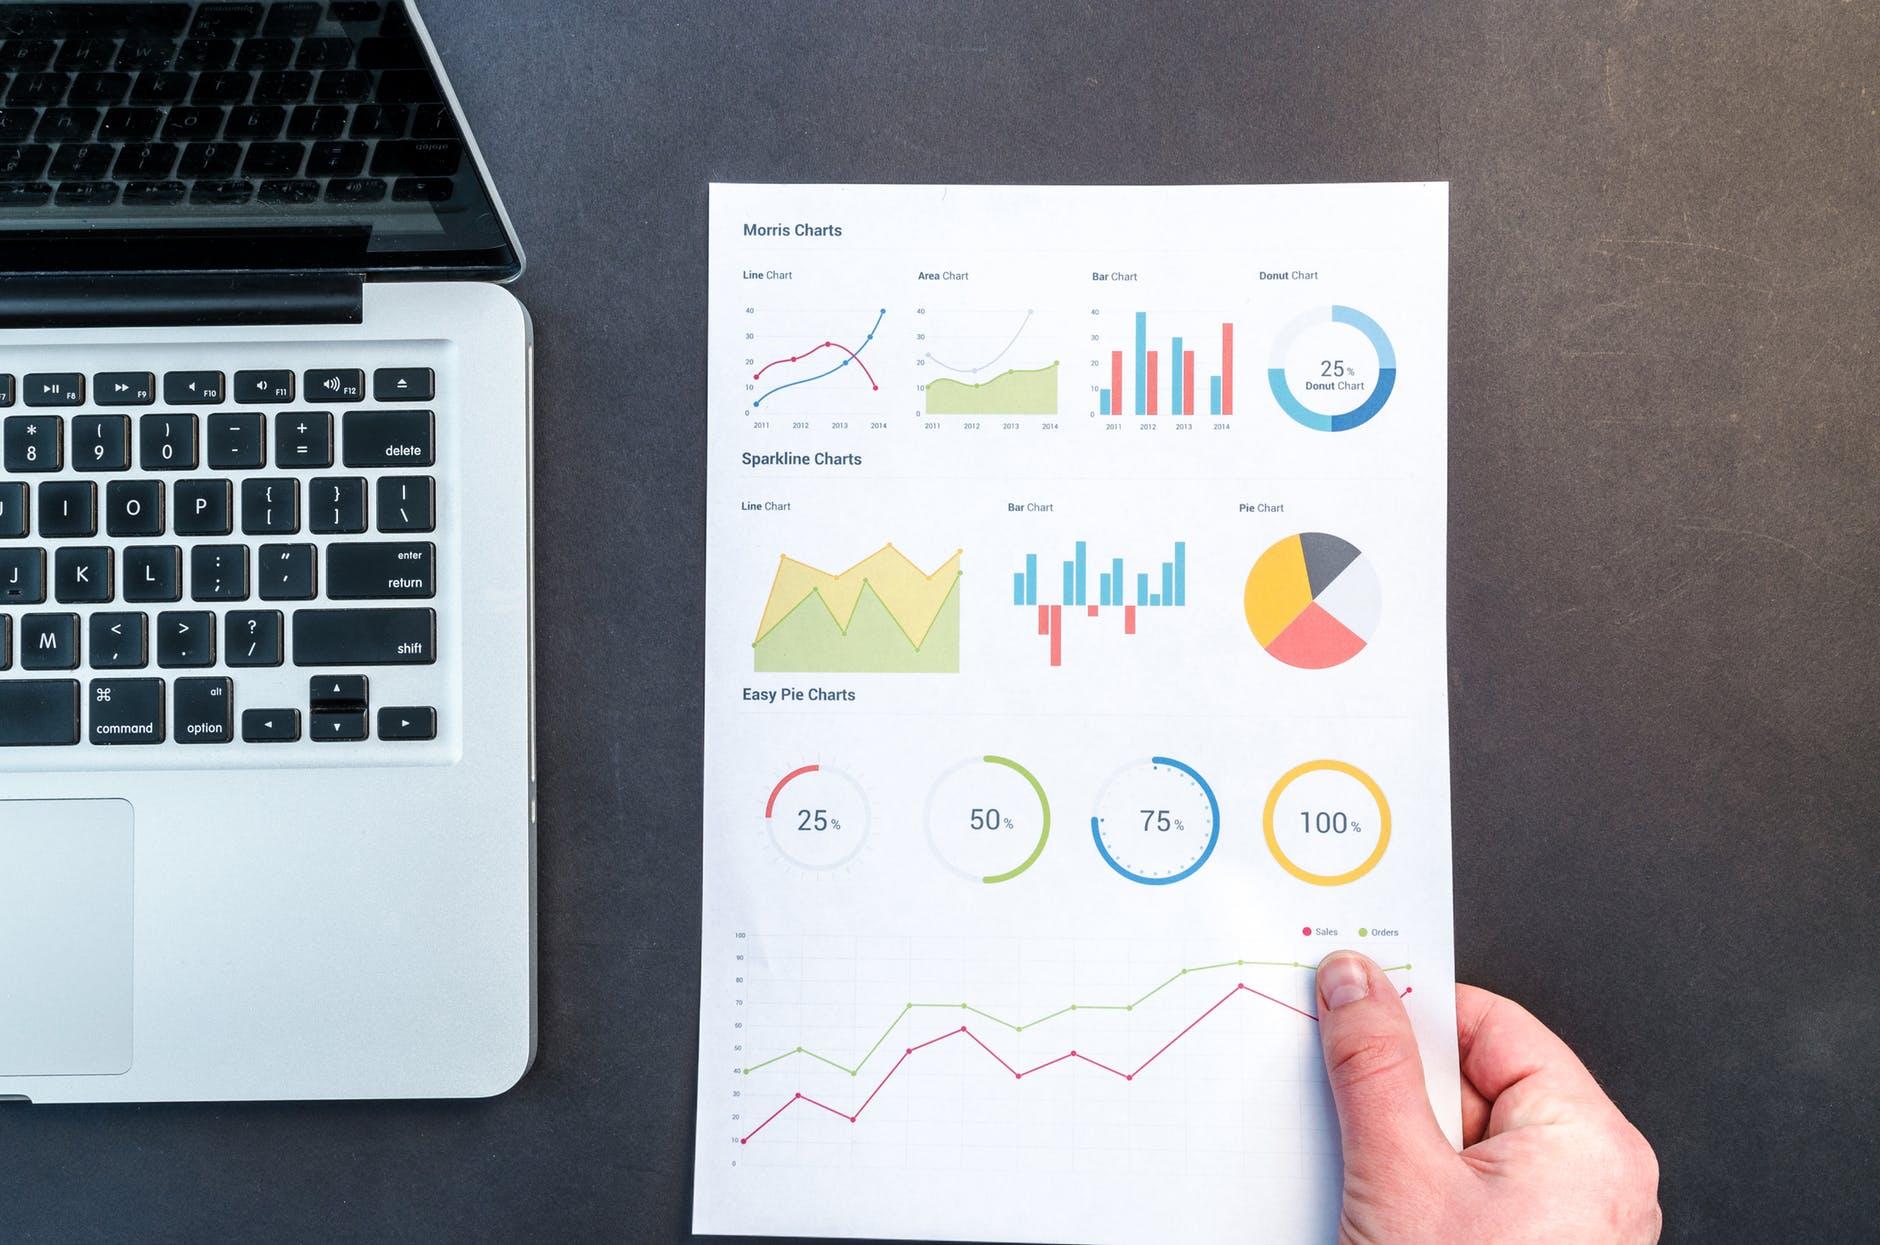 10 Survey Design Tips for Financial Services